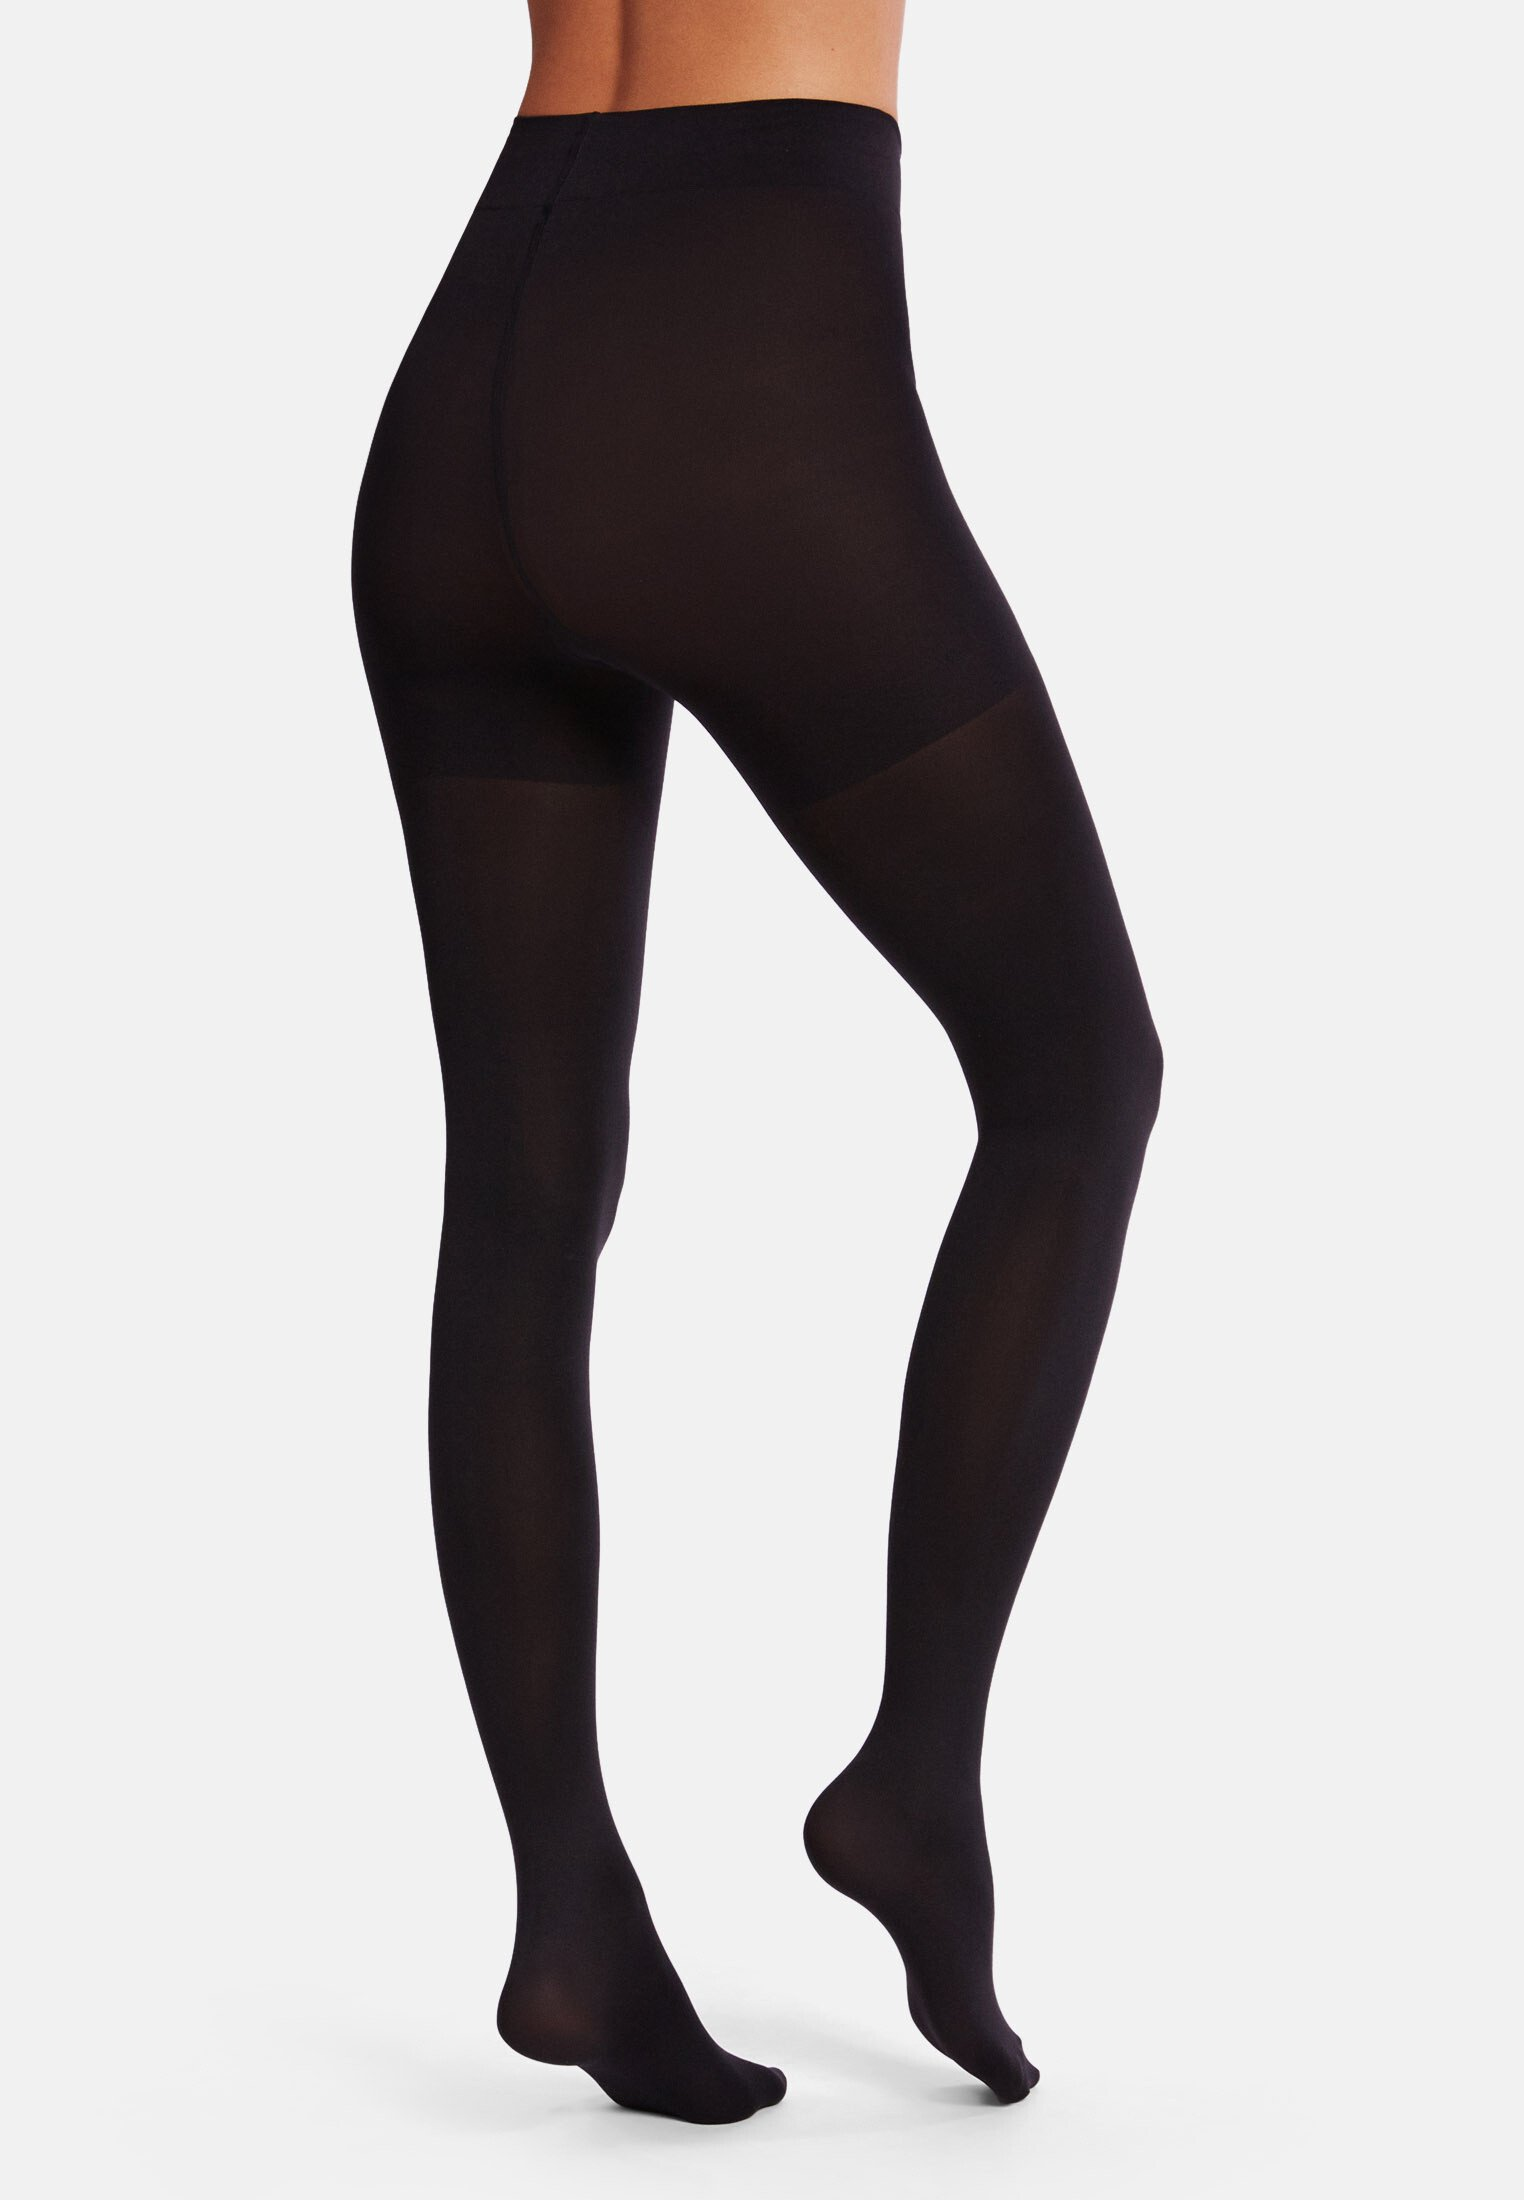 Damen Leggings - Strümpfe